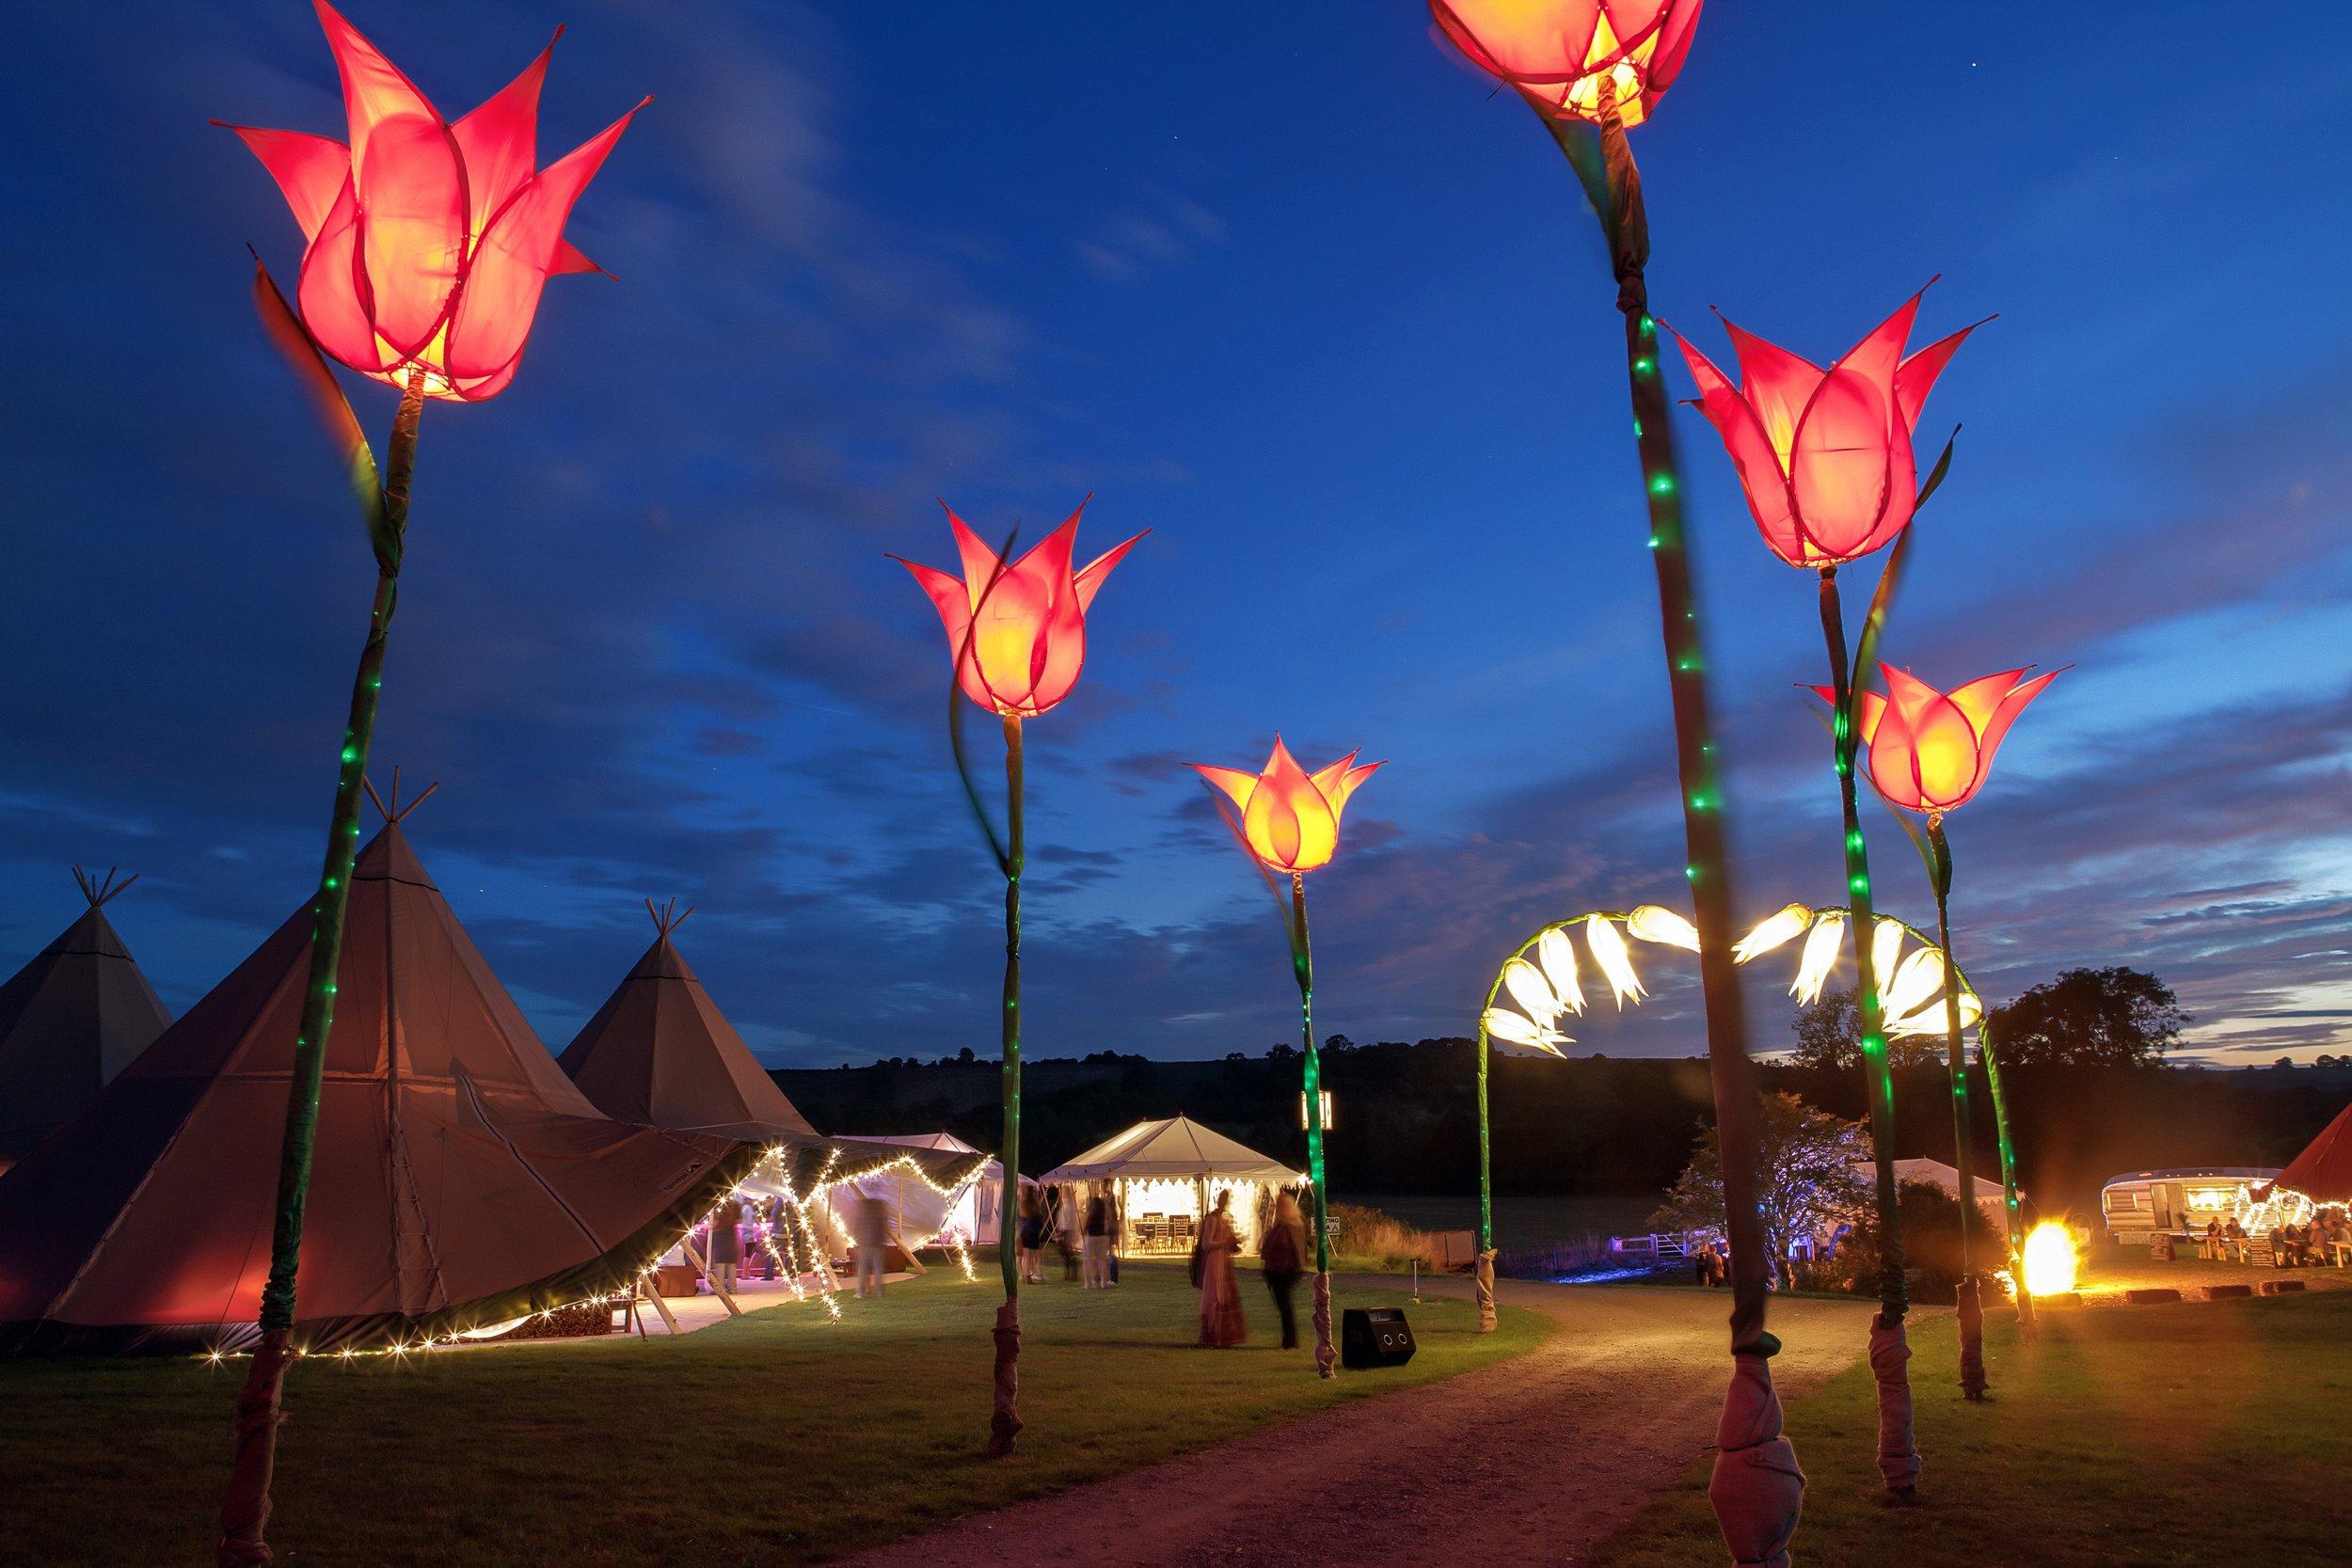 Festival bride ideas